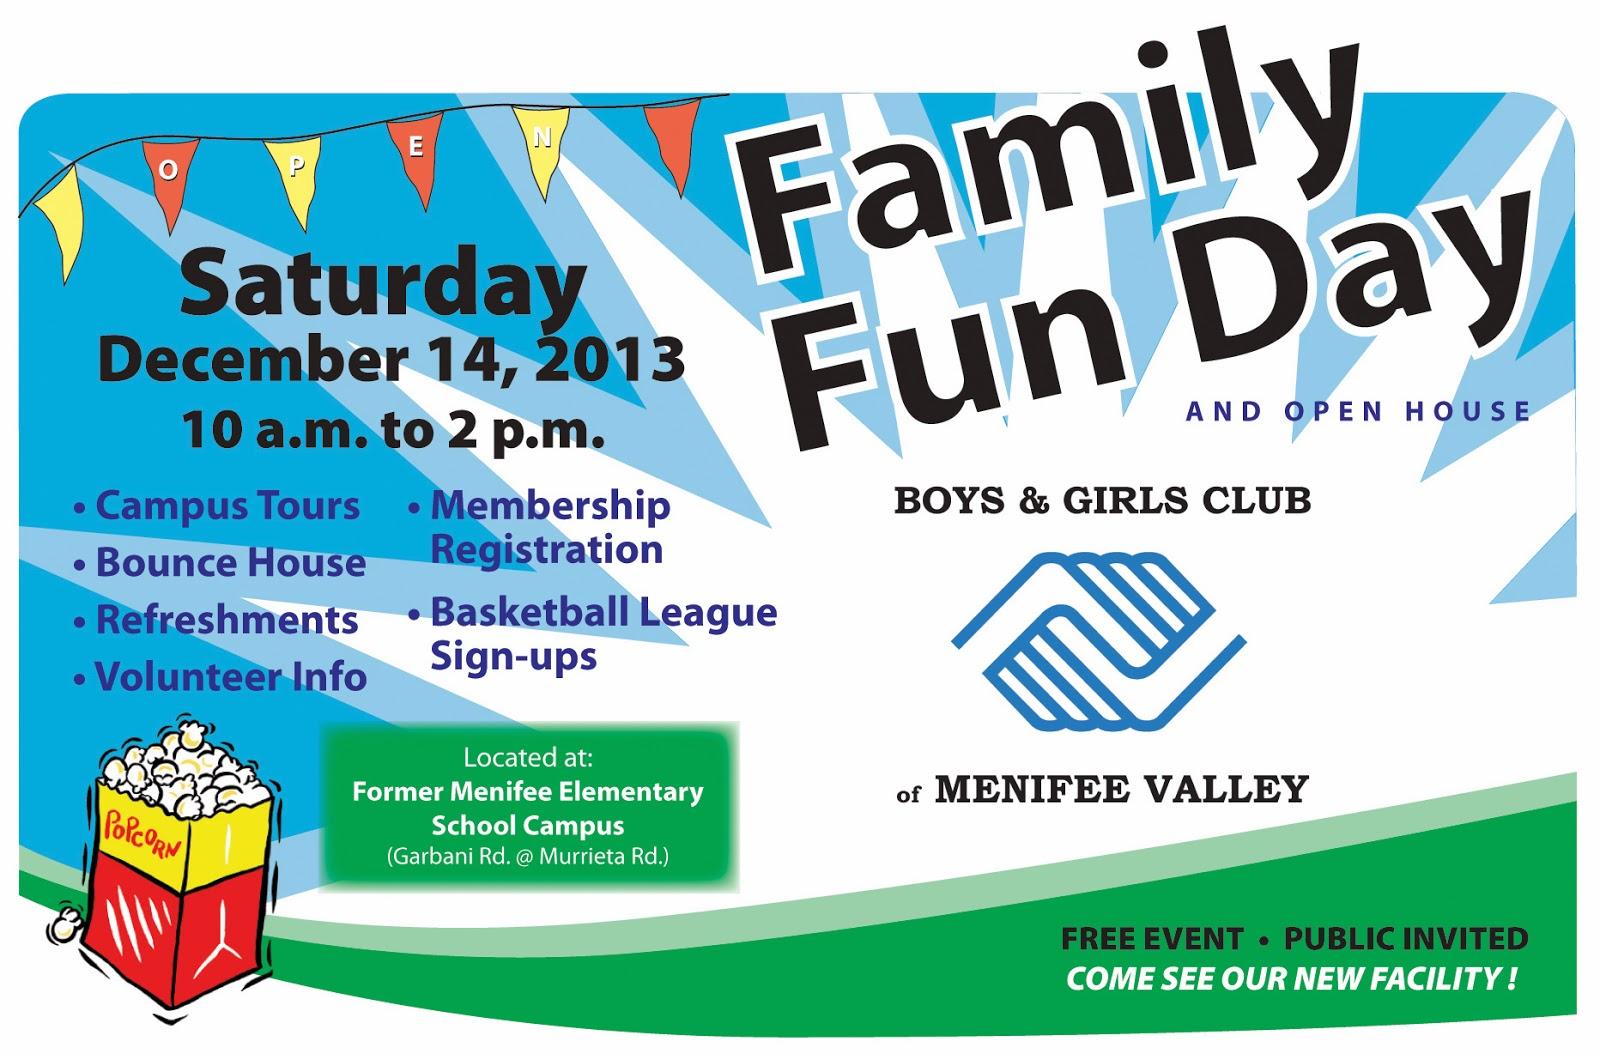 family fun day at menifee valley boys girls club dec 14 menifee